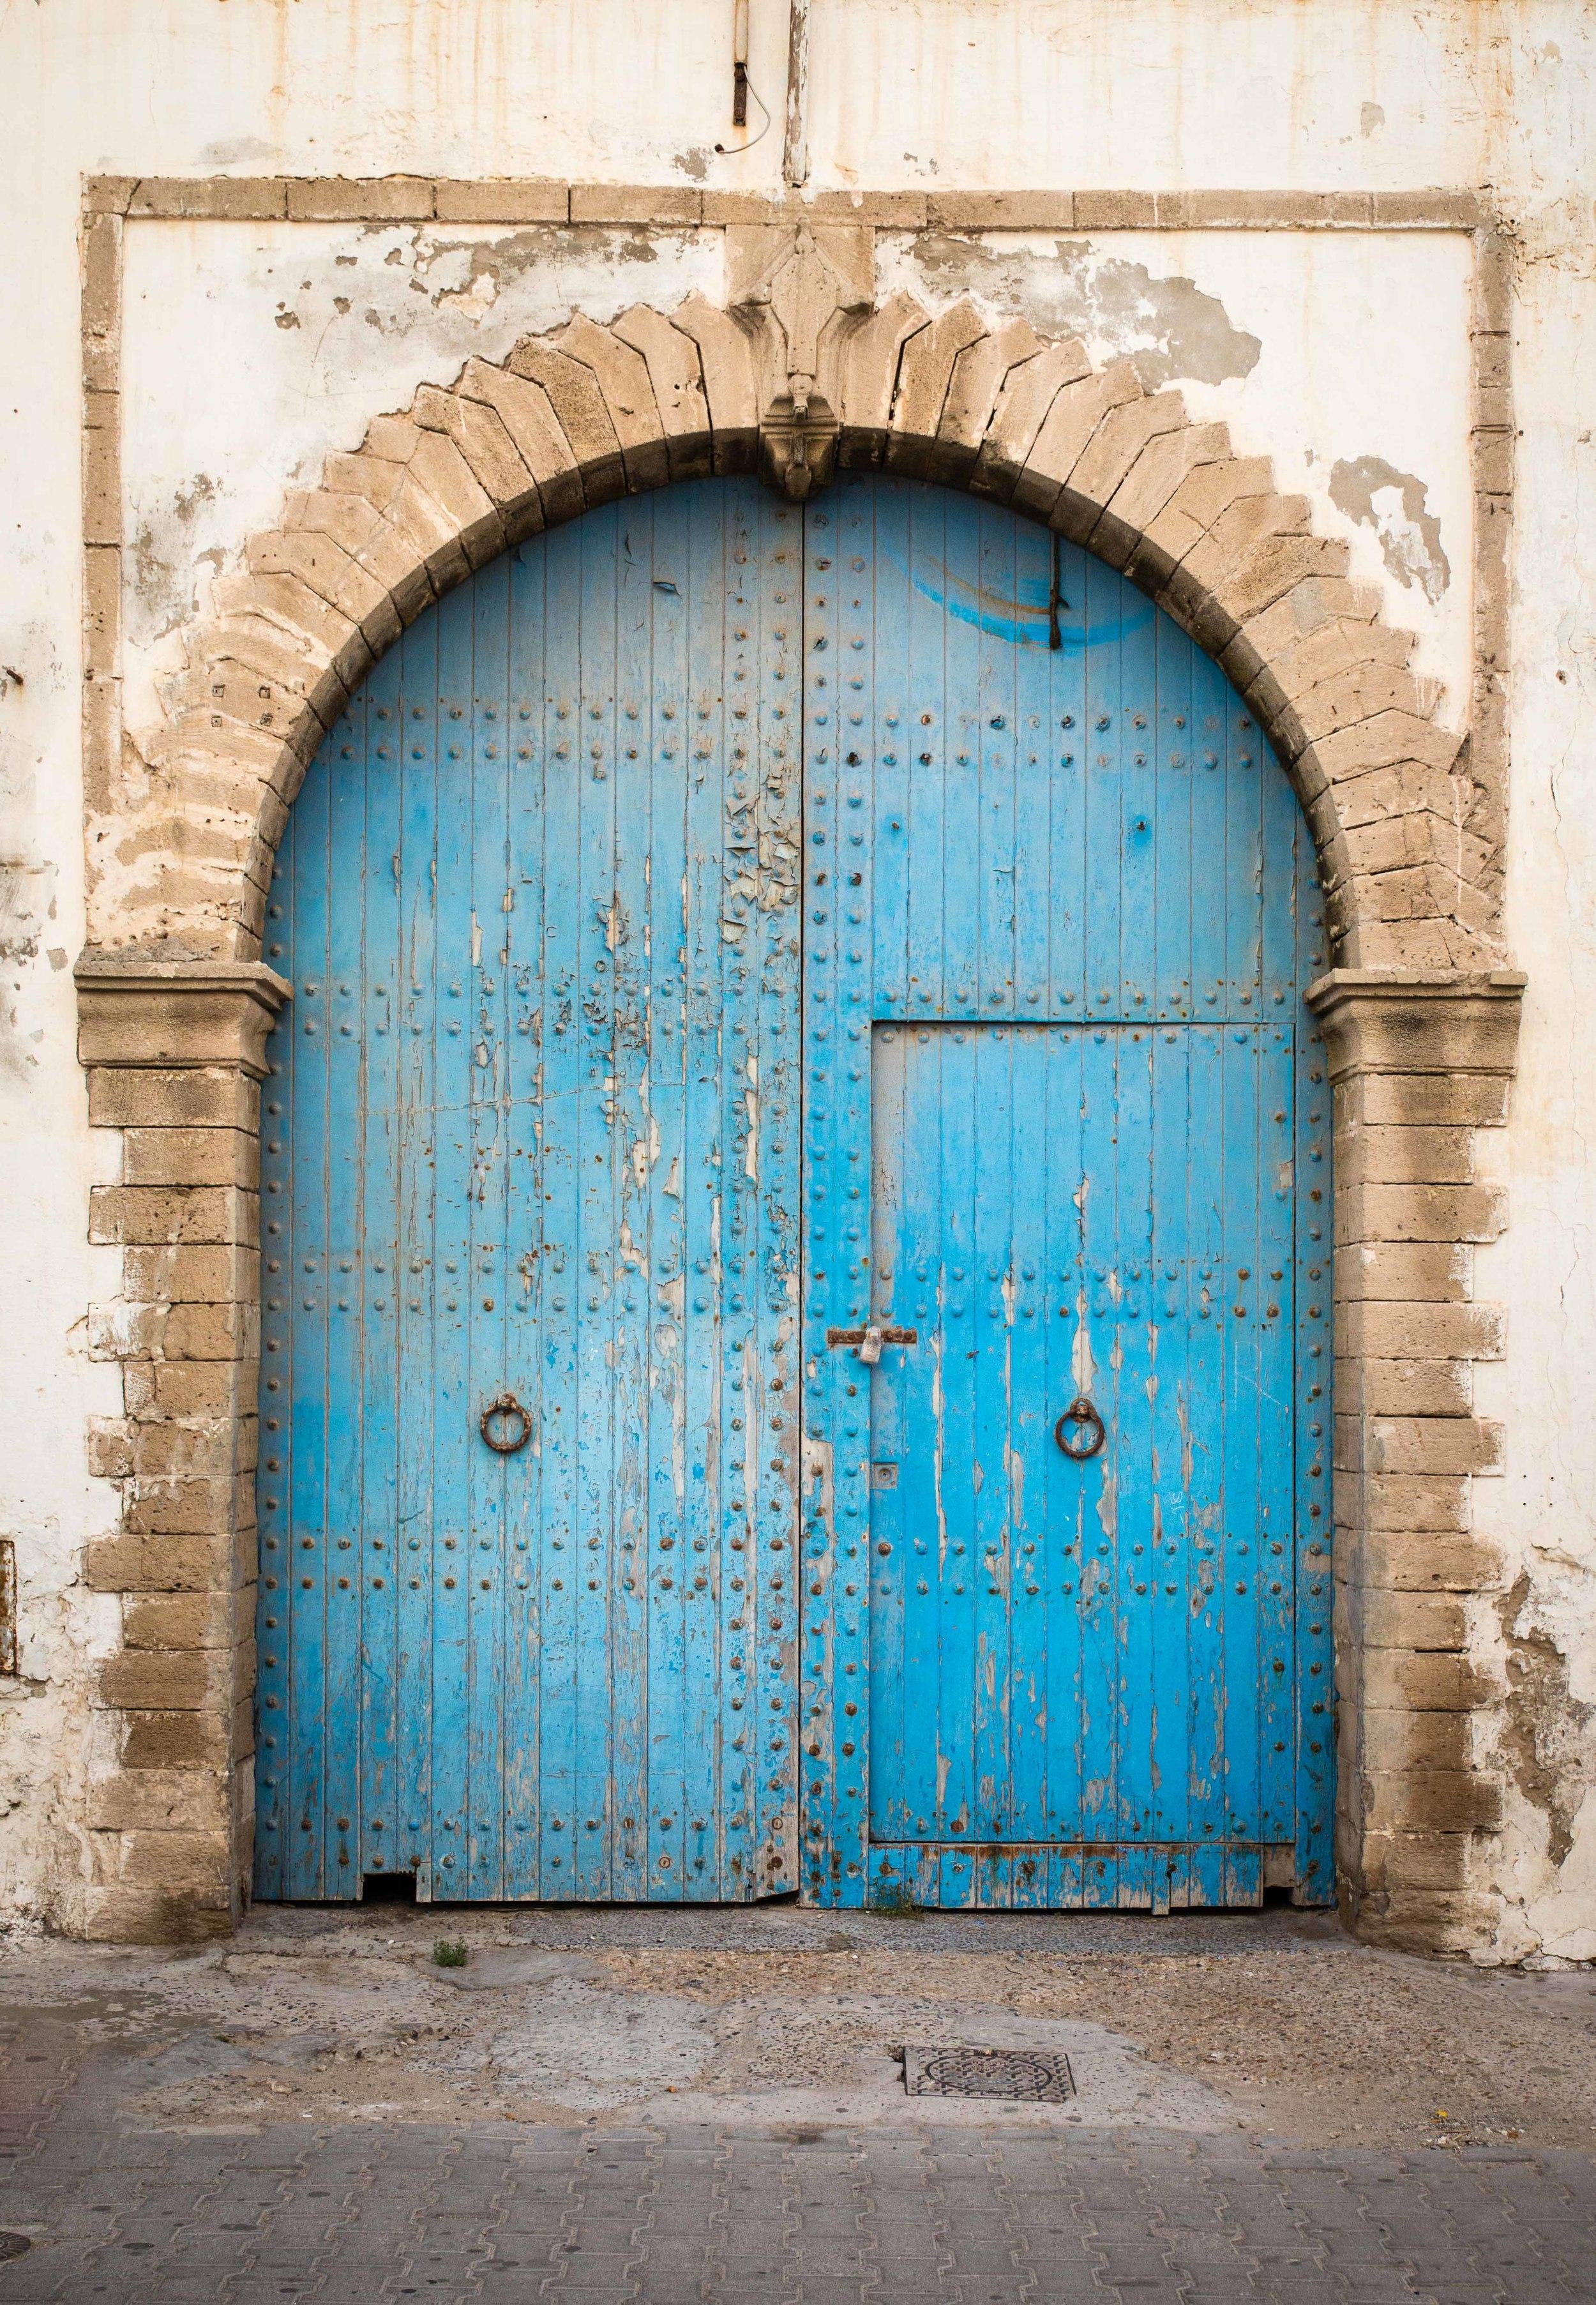 One of my favorite doors.